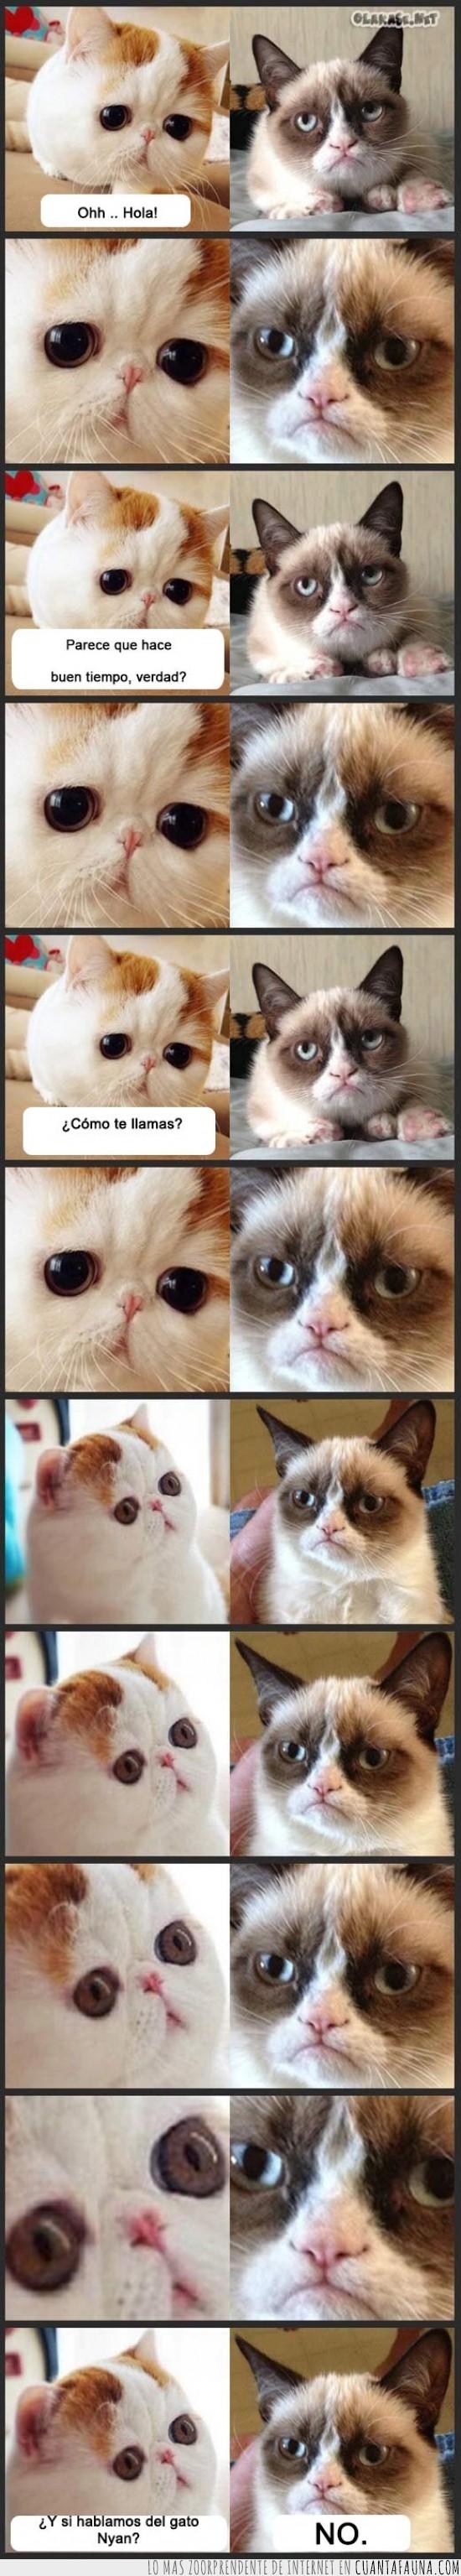 conocerse,gato gruñon,Grumpy cat,hablar,nyan cat